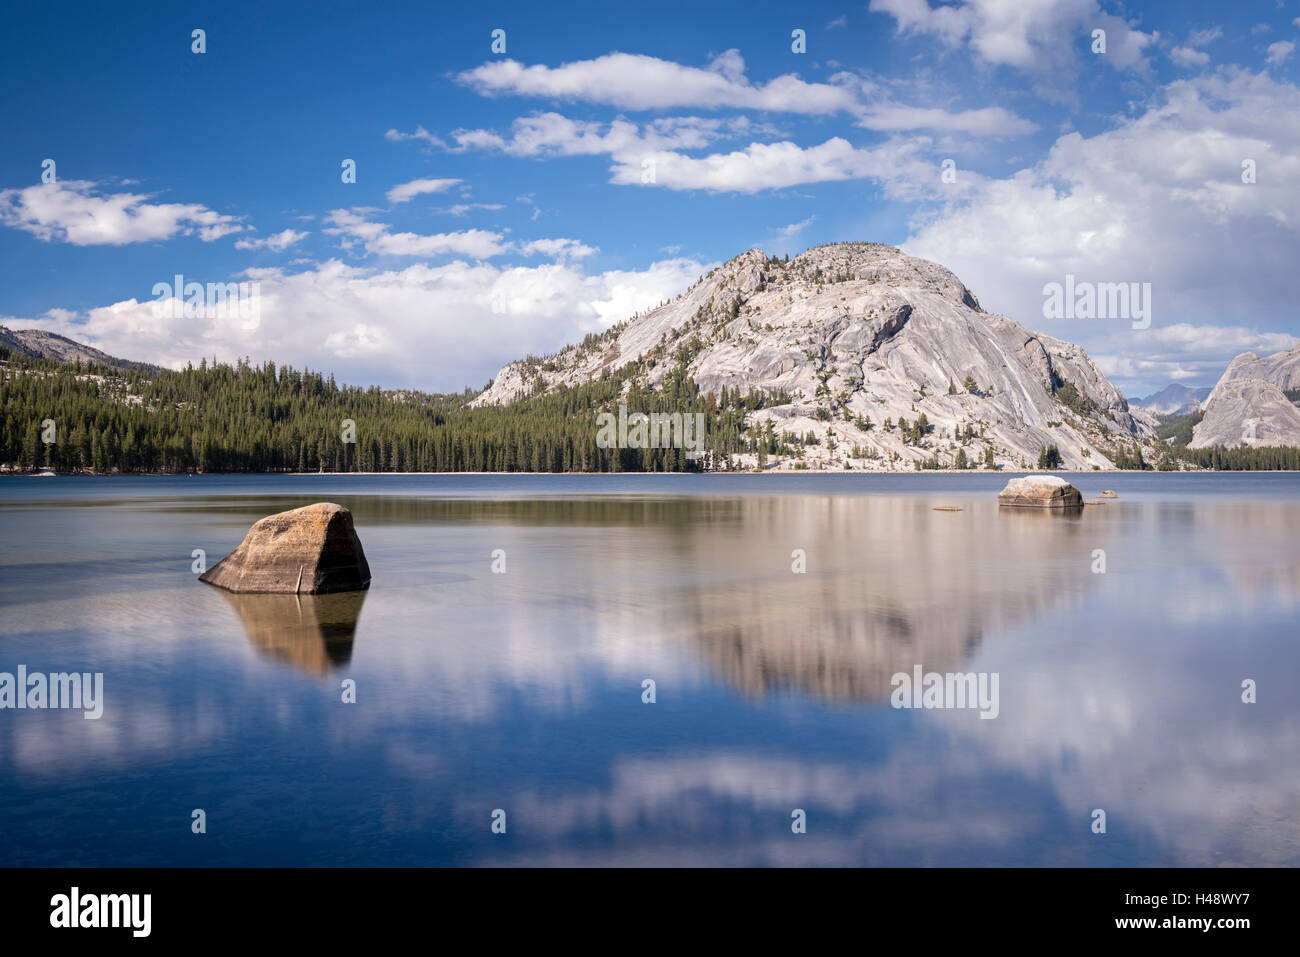 Lac Tenaya dans Yosemite National Park, California, USA. L'automne (octobre) 2014. Photo Stock